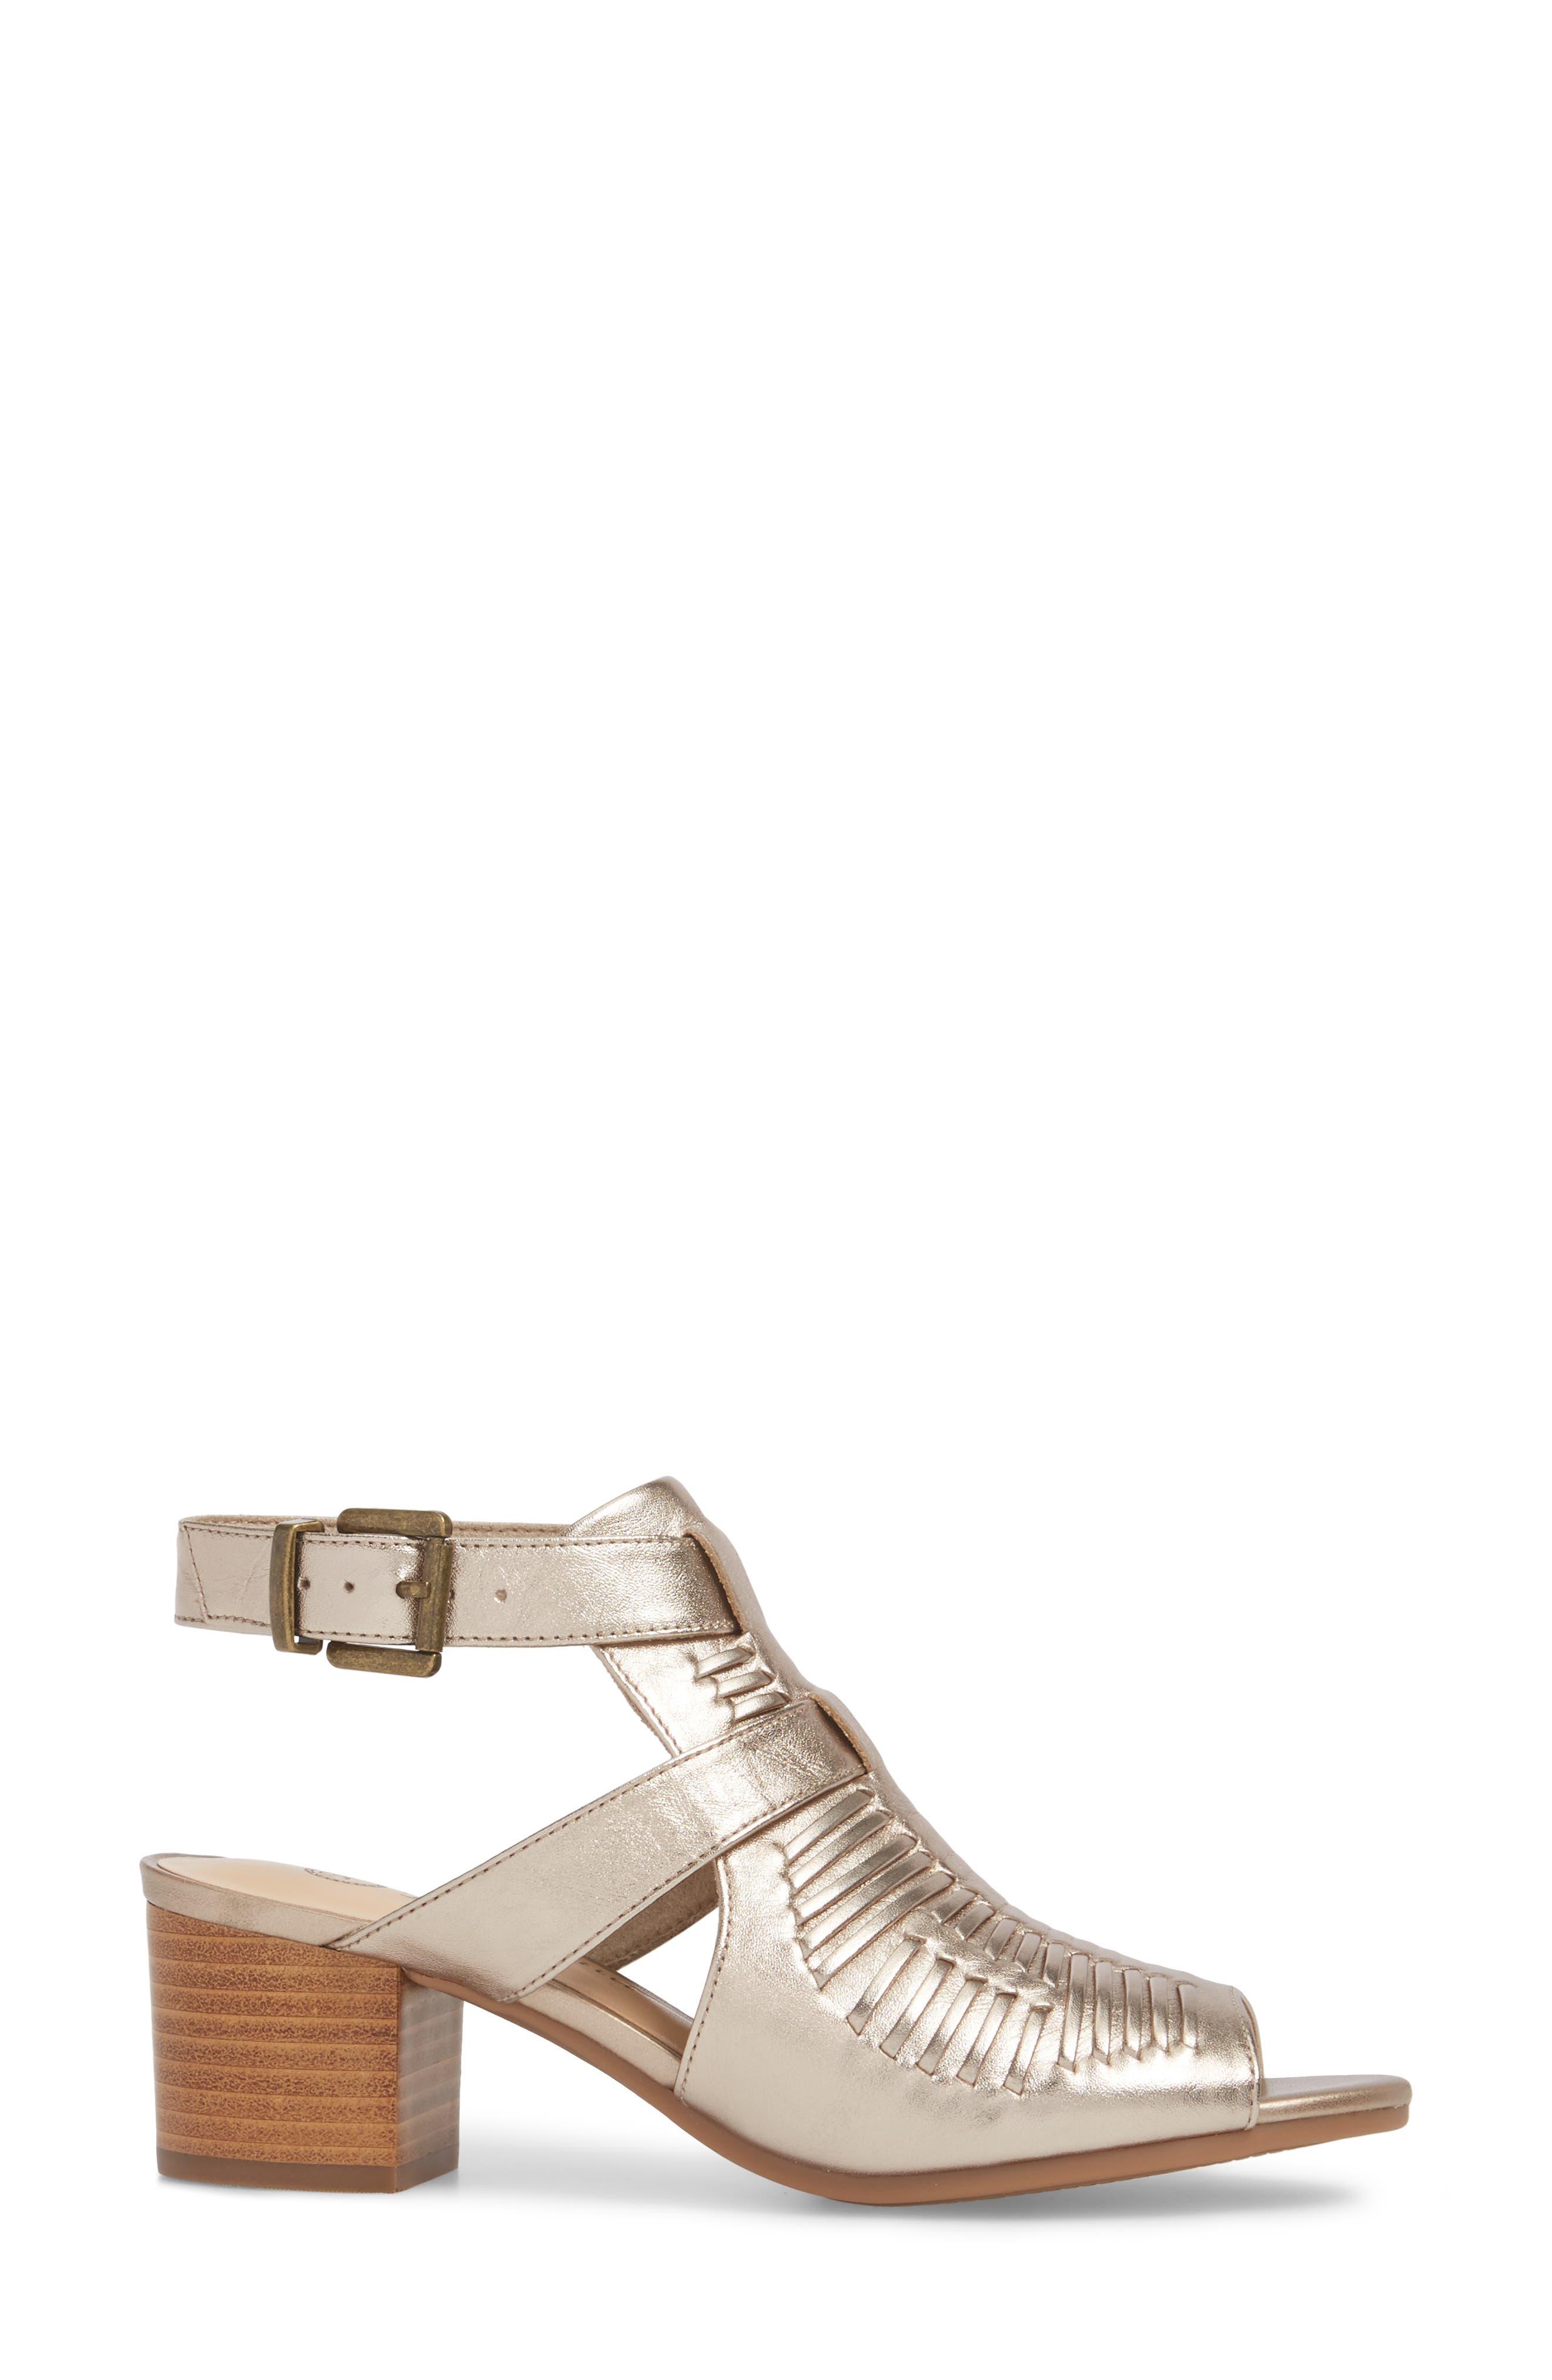 Finley Ankle Strap Sandal,                             Alternate thumbnail 13, color,